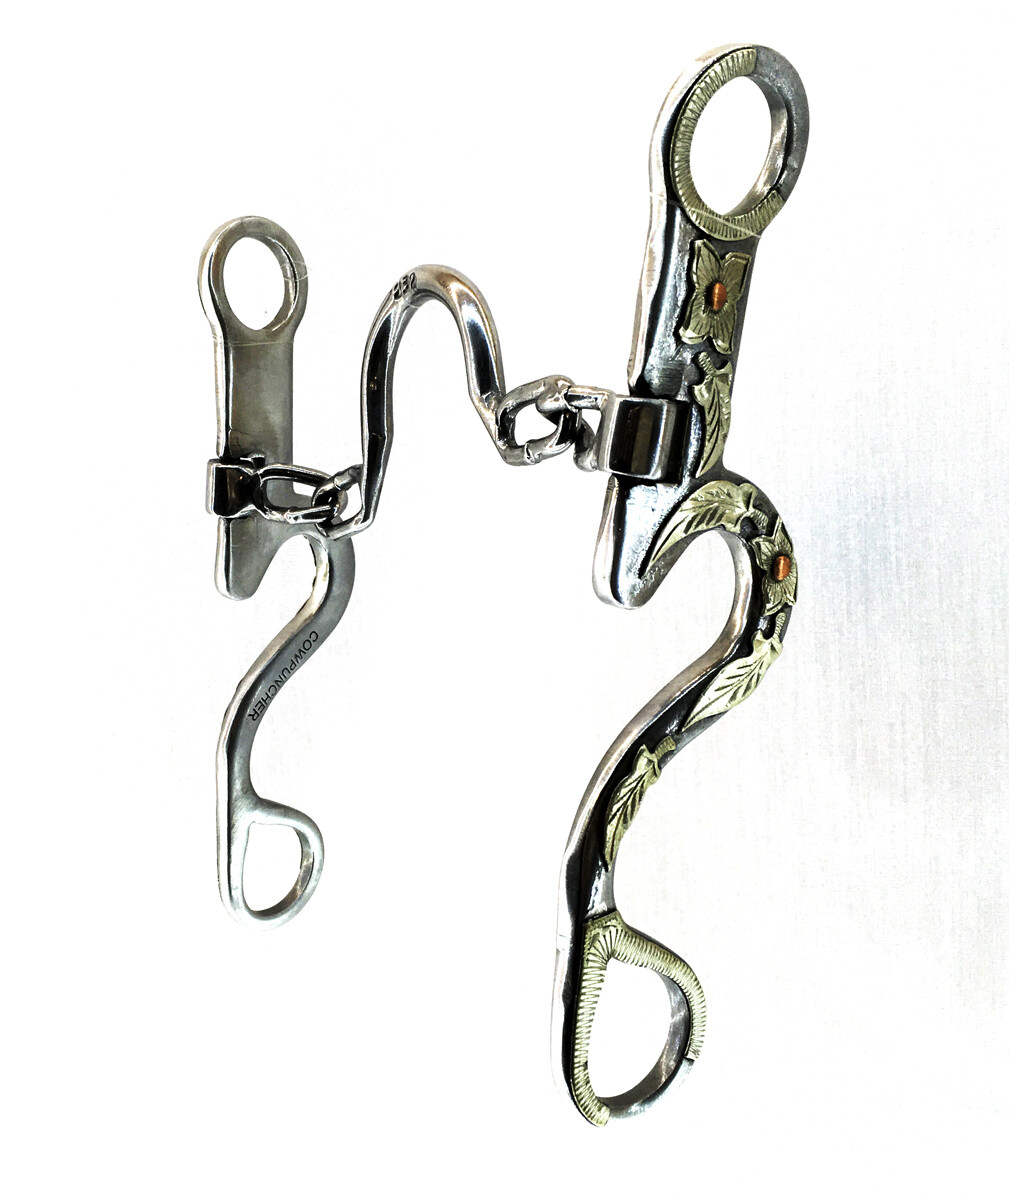 Port Chain Bit CP232